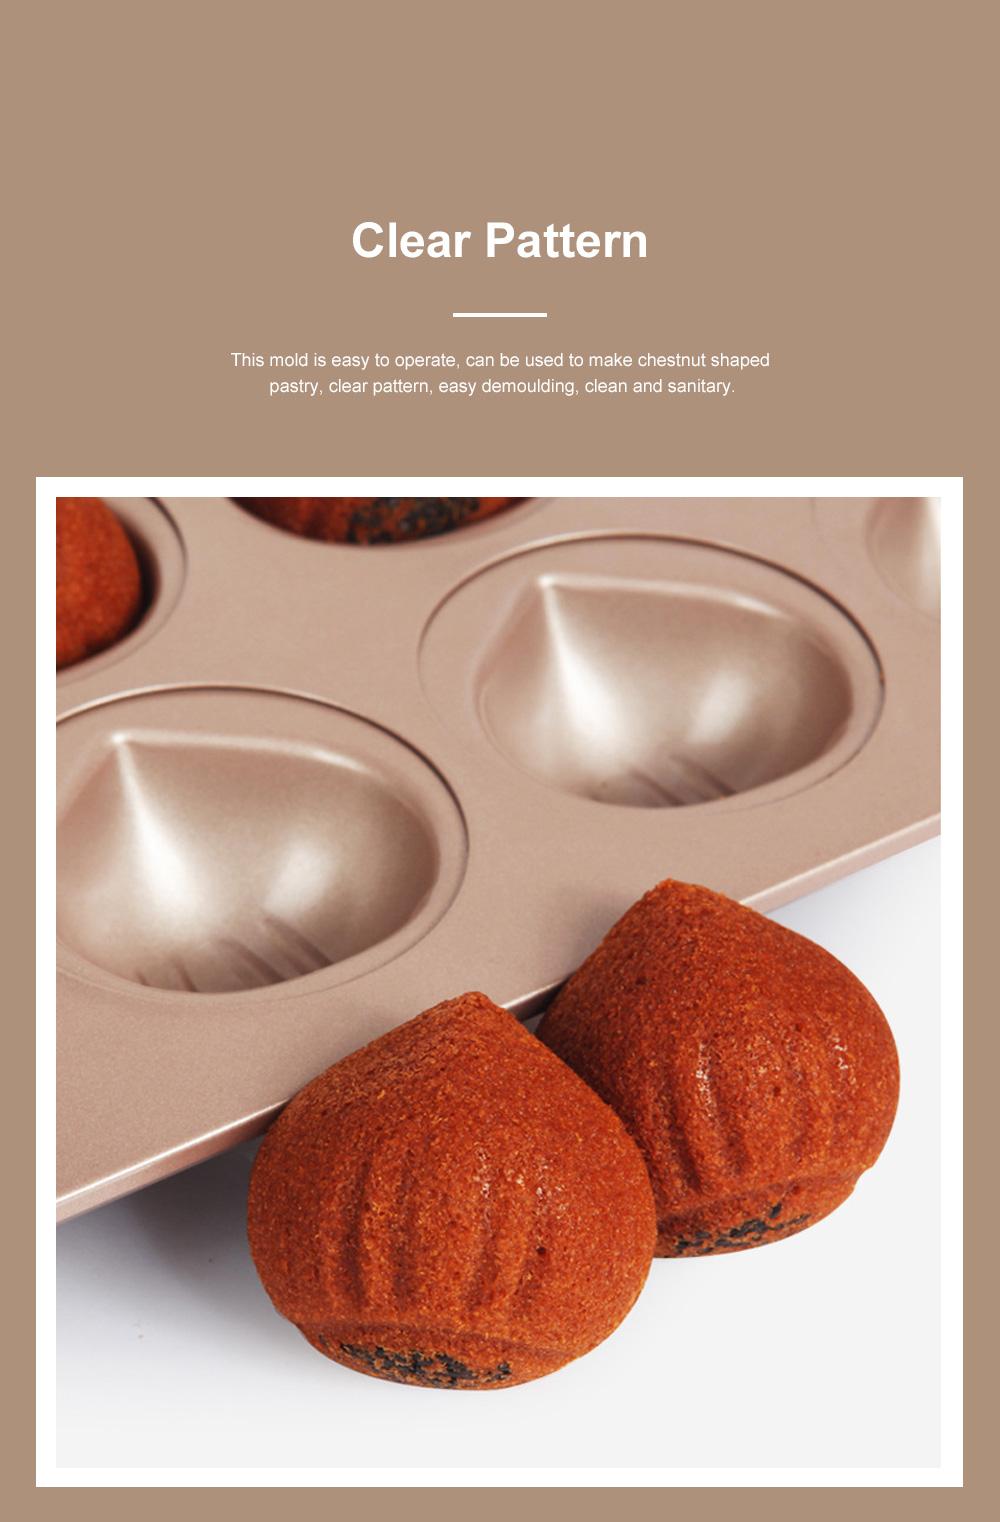 Chefmade 12 Cup Chestnut Cake Mold Non Stick Cake Mold Baking Plate Baking Mold Golden 2